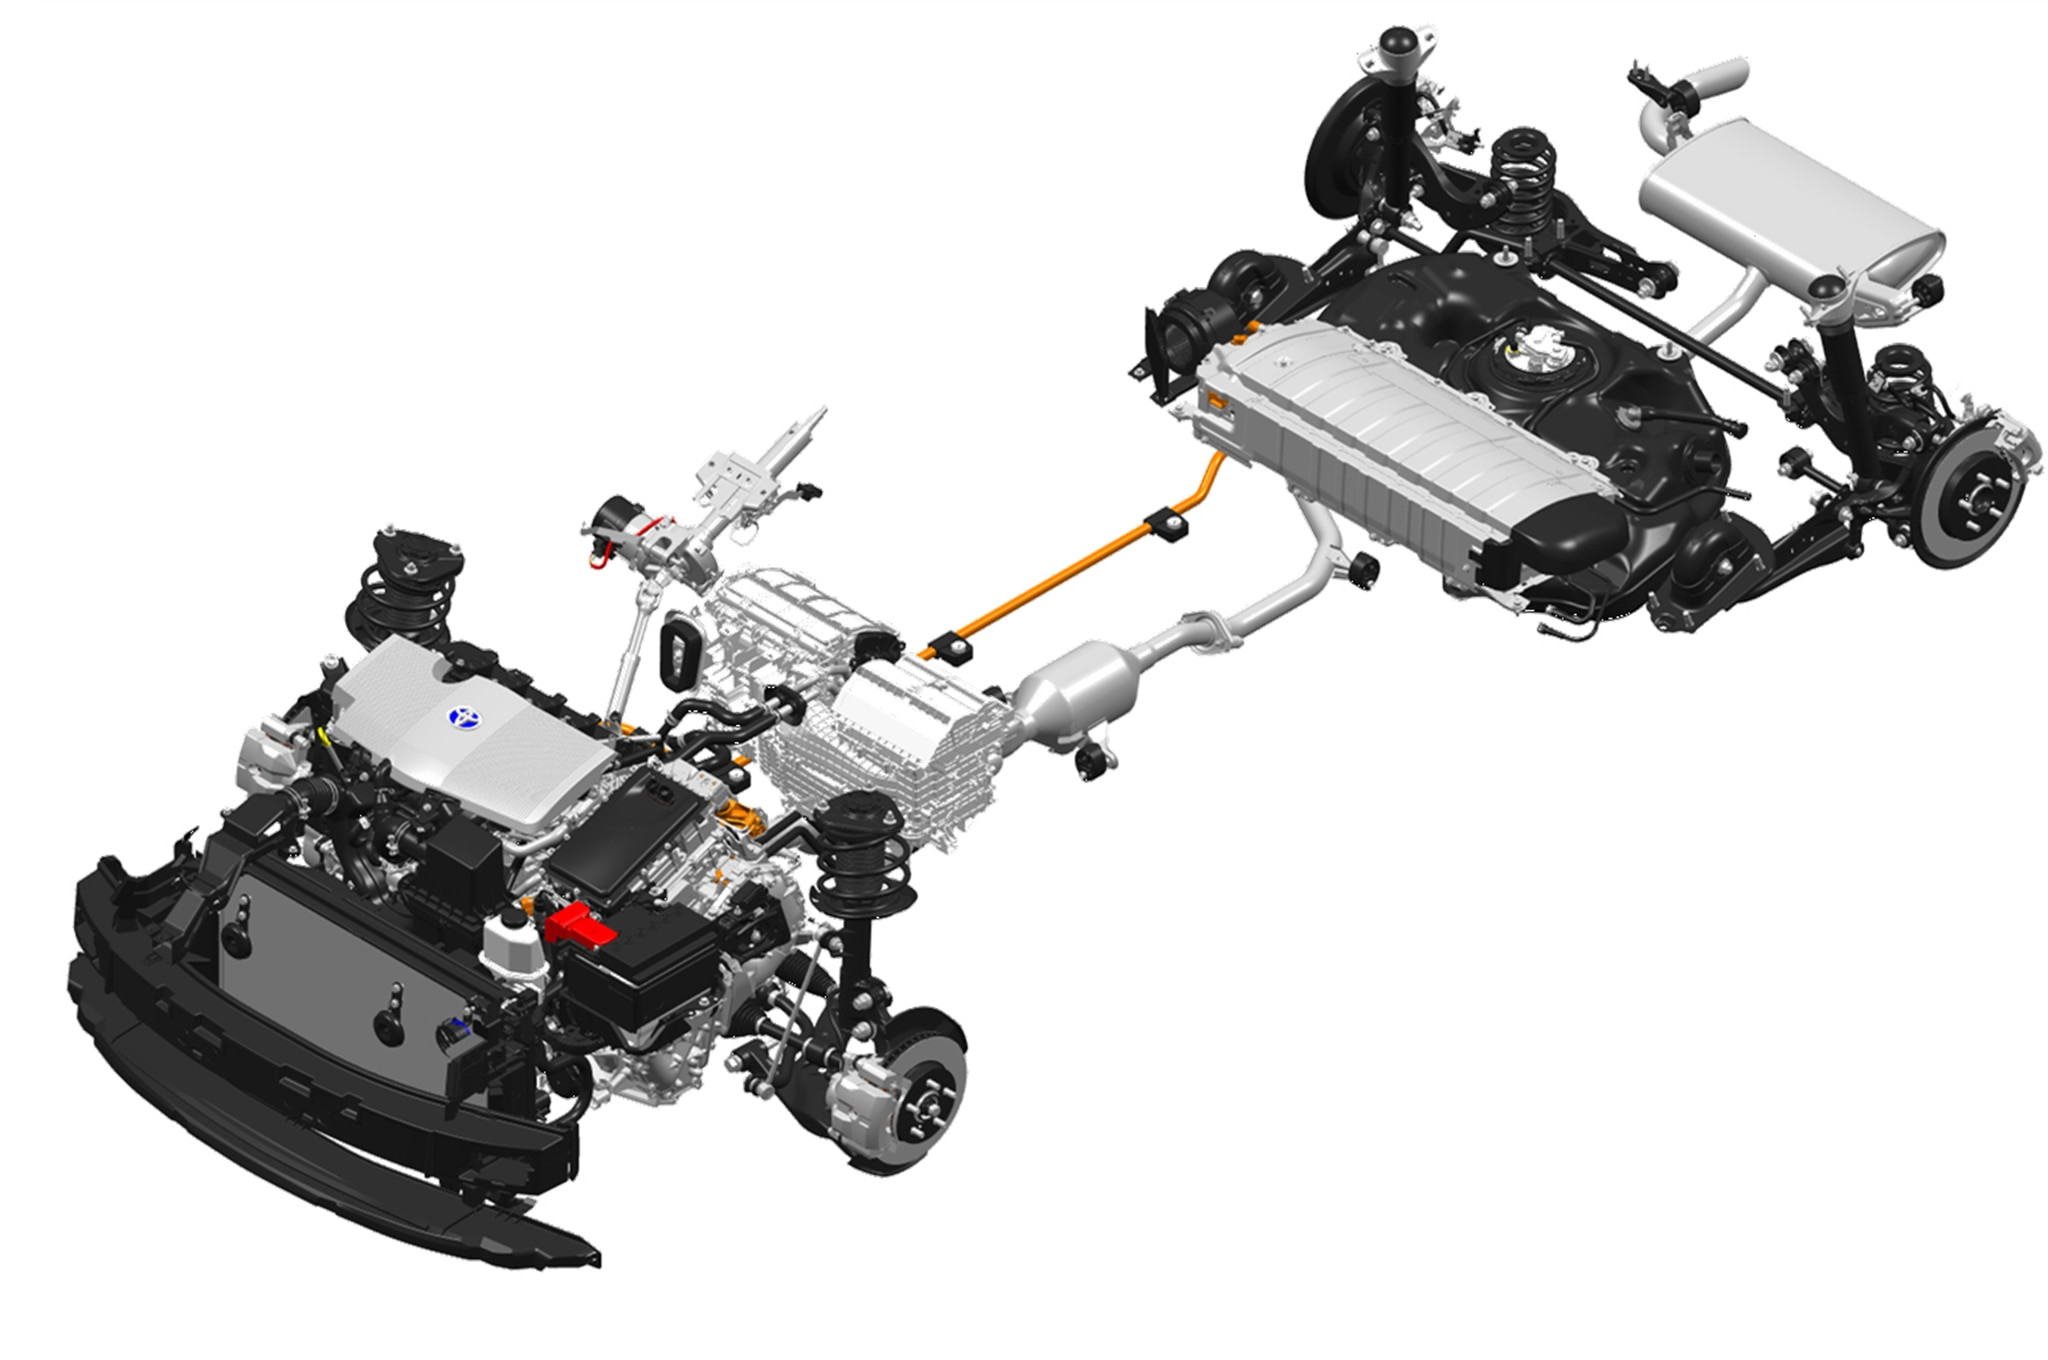 prius rear suspension diagram prius database wiring diagram 2016 toyota prius hv system layout